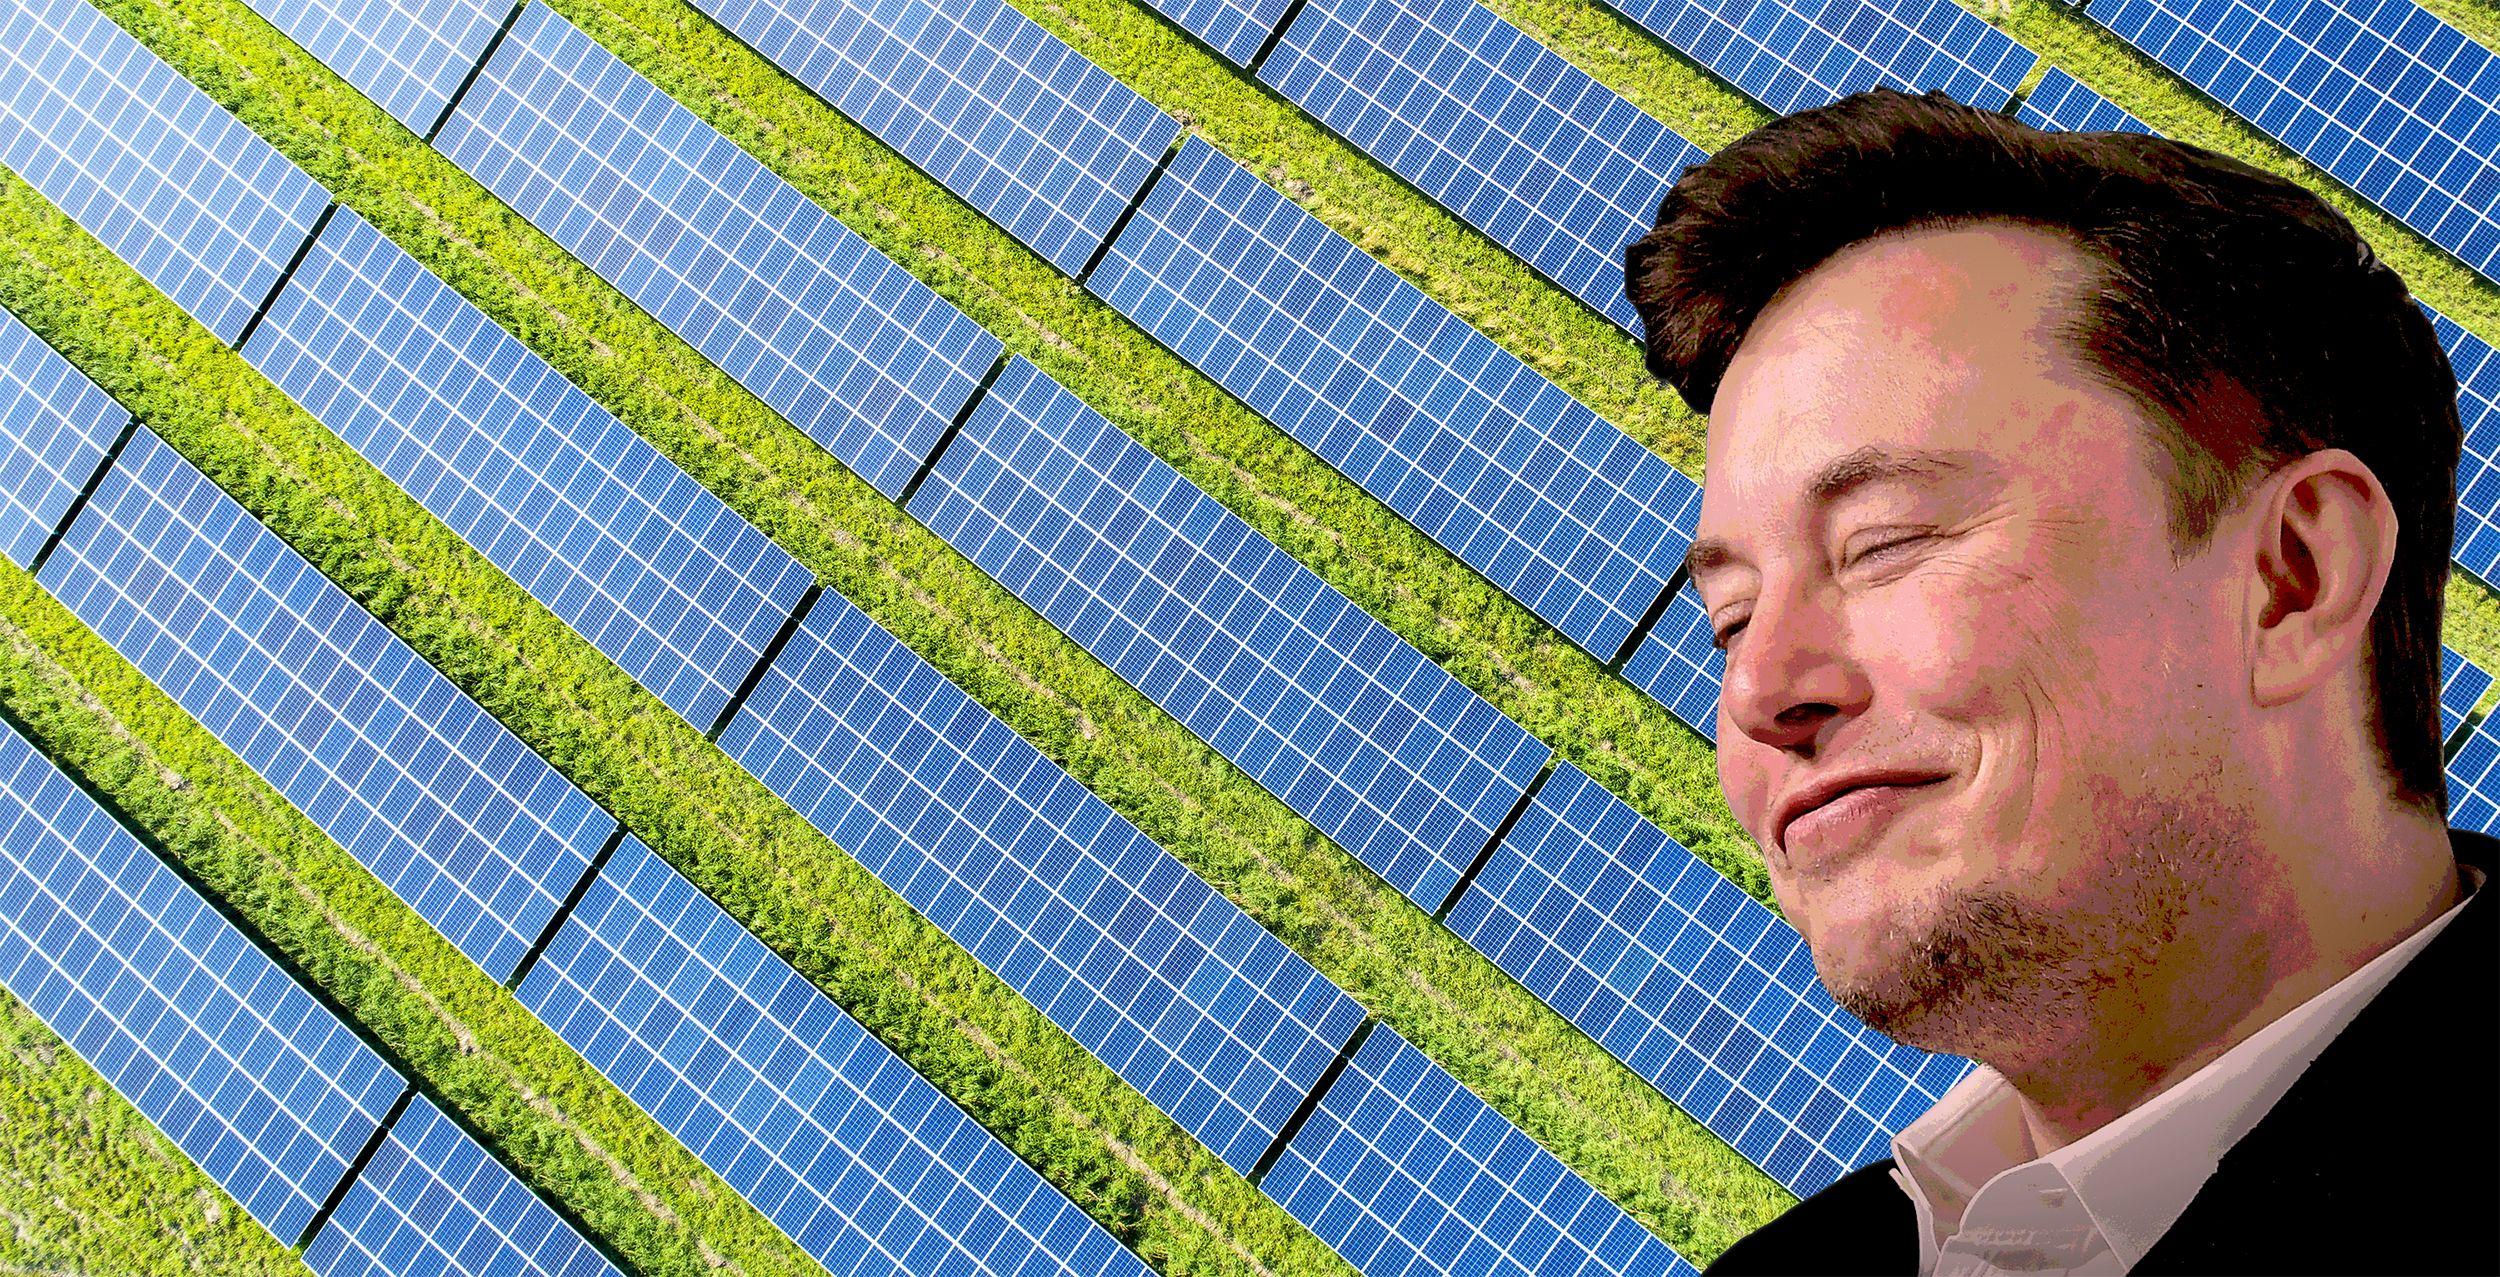 Elon Musk's Plan for One Giant Solar Farm Is a Little Insane, but Not Completely Insane